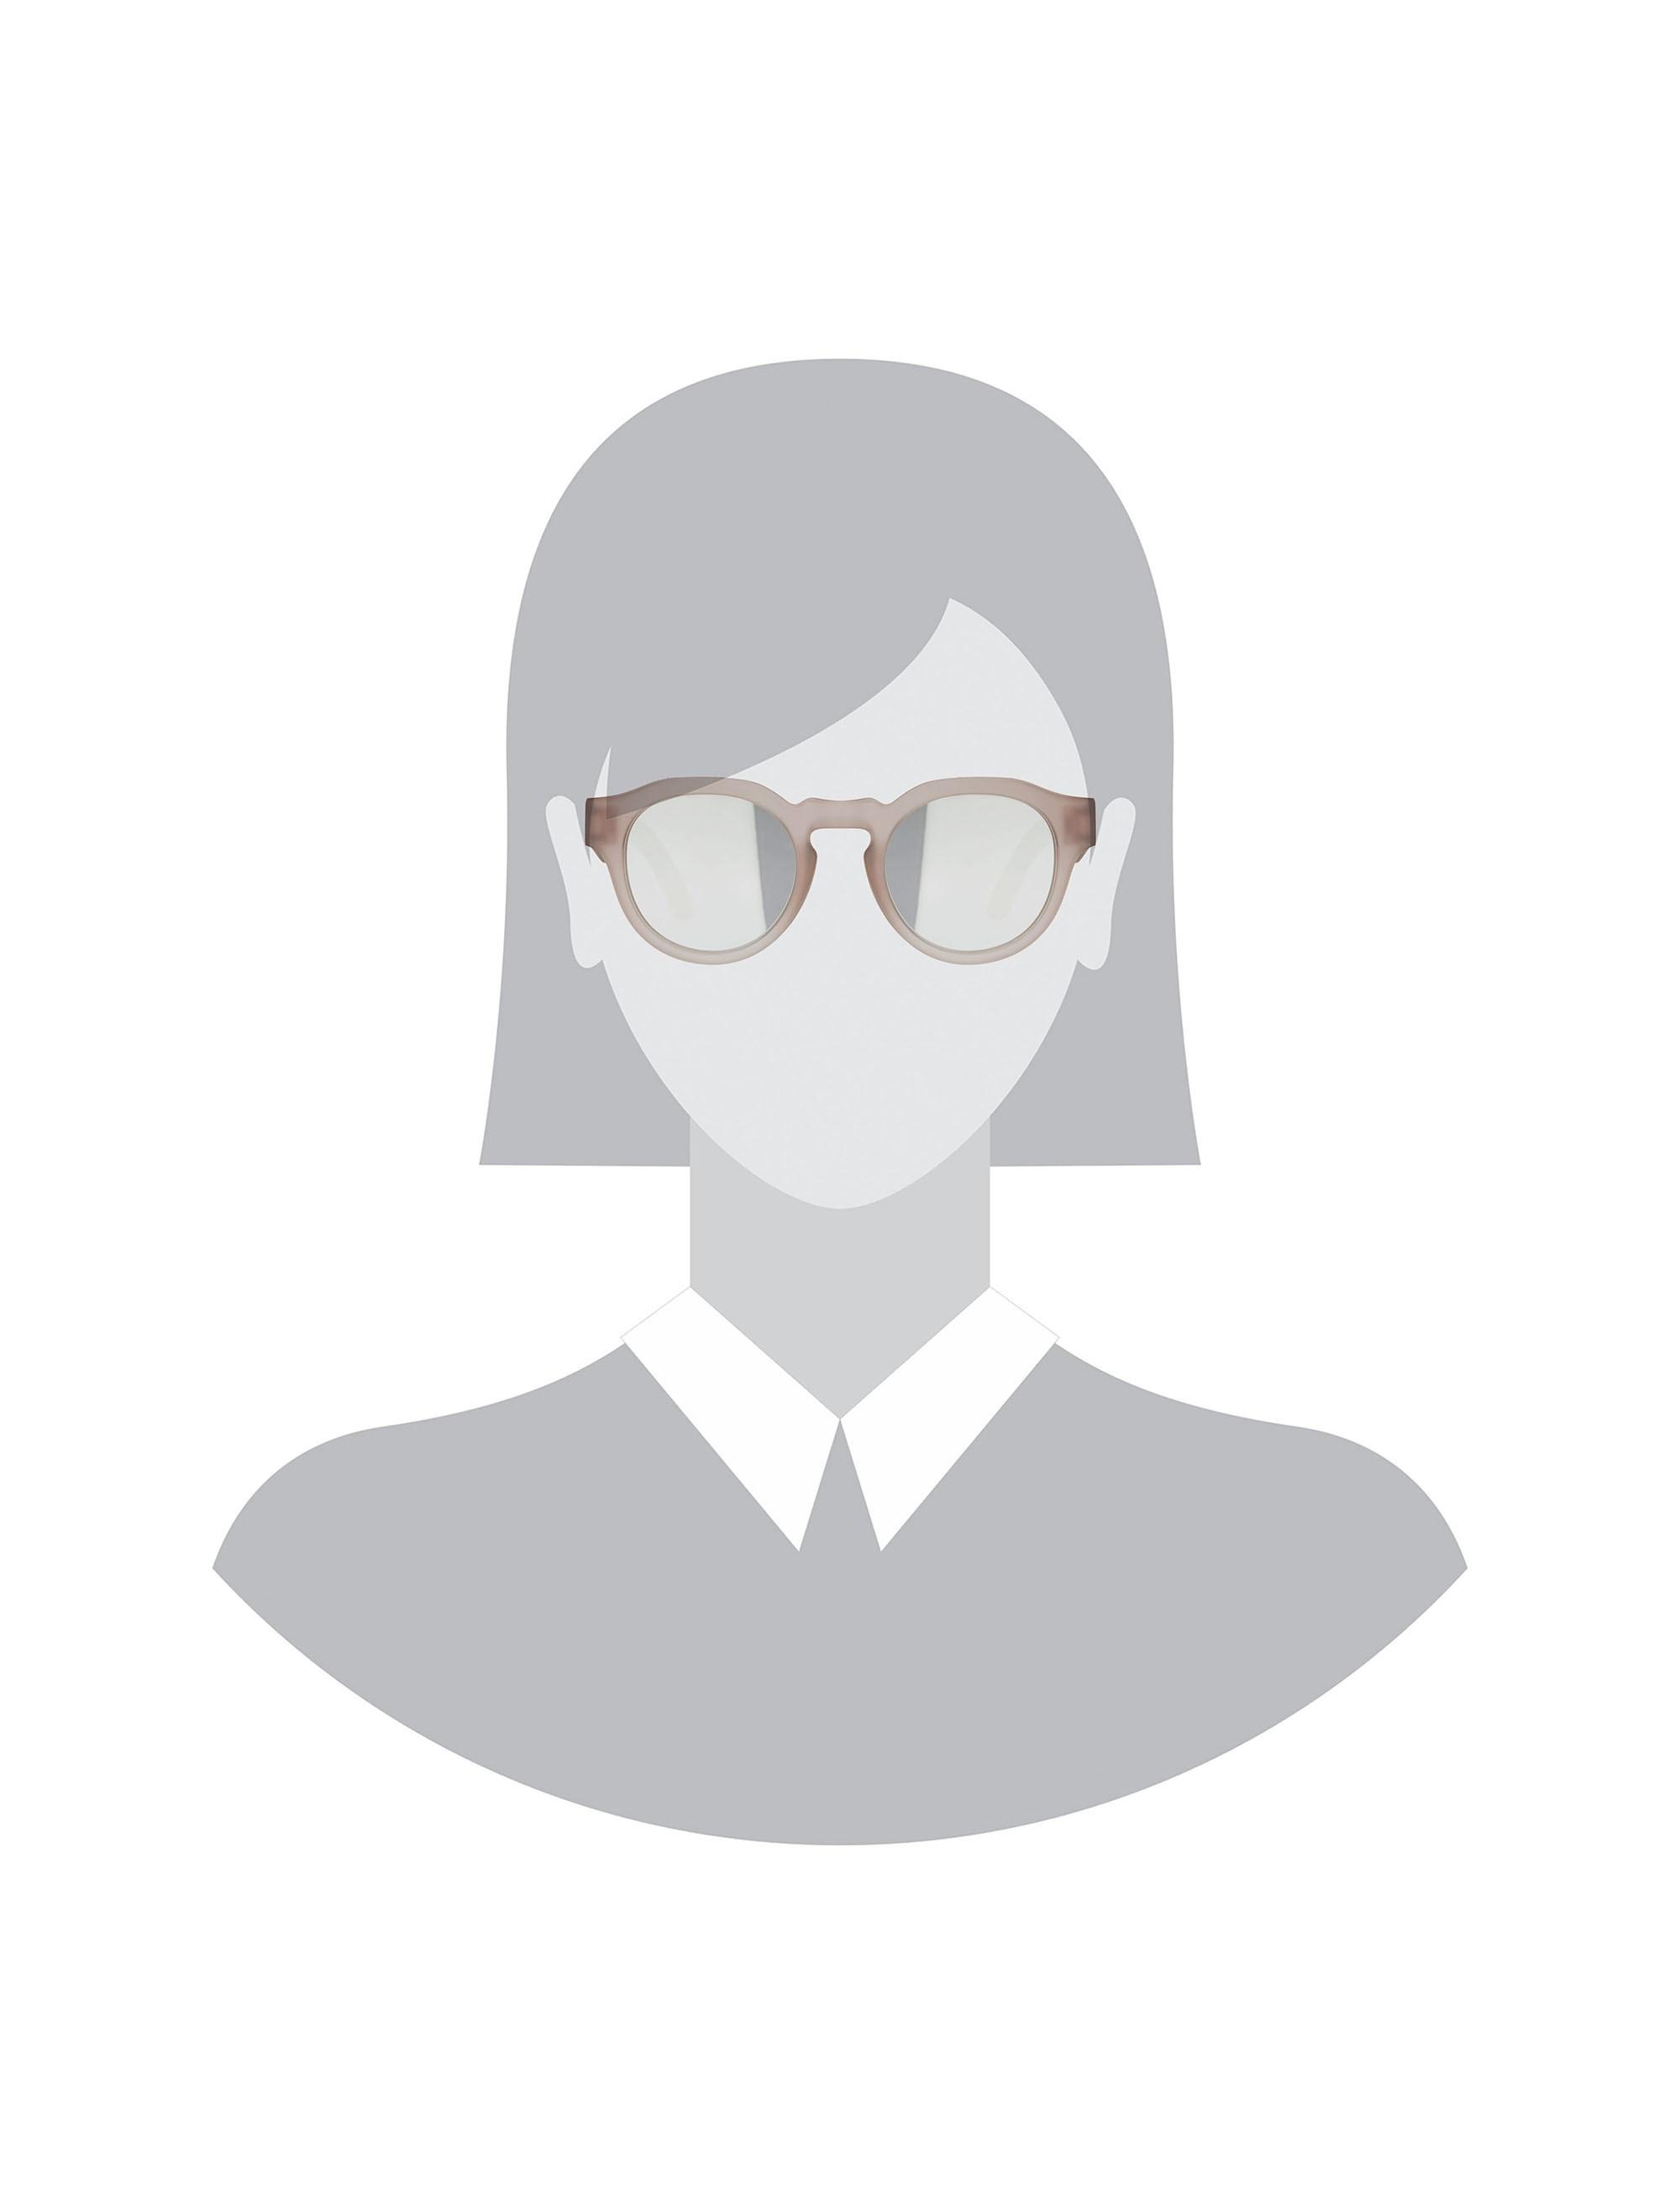 عینک آفتابی پنتوس بزرگسال Bryton - تامز - صورتي - 5